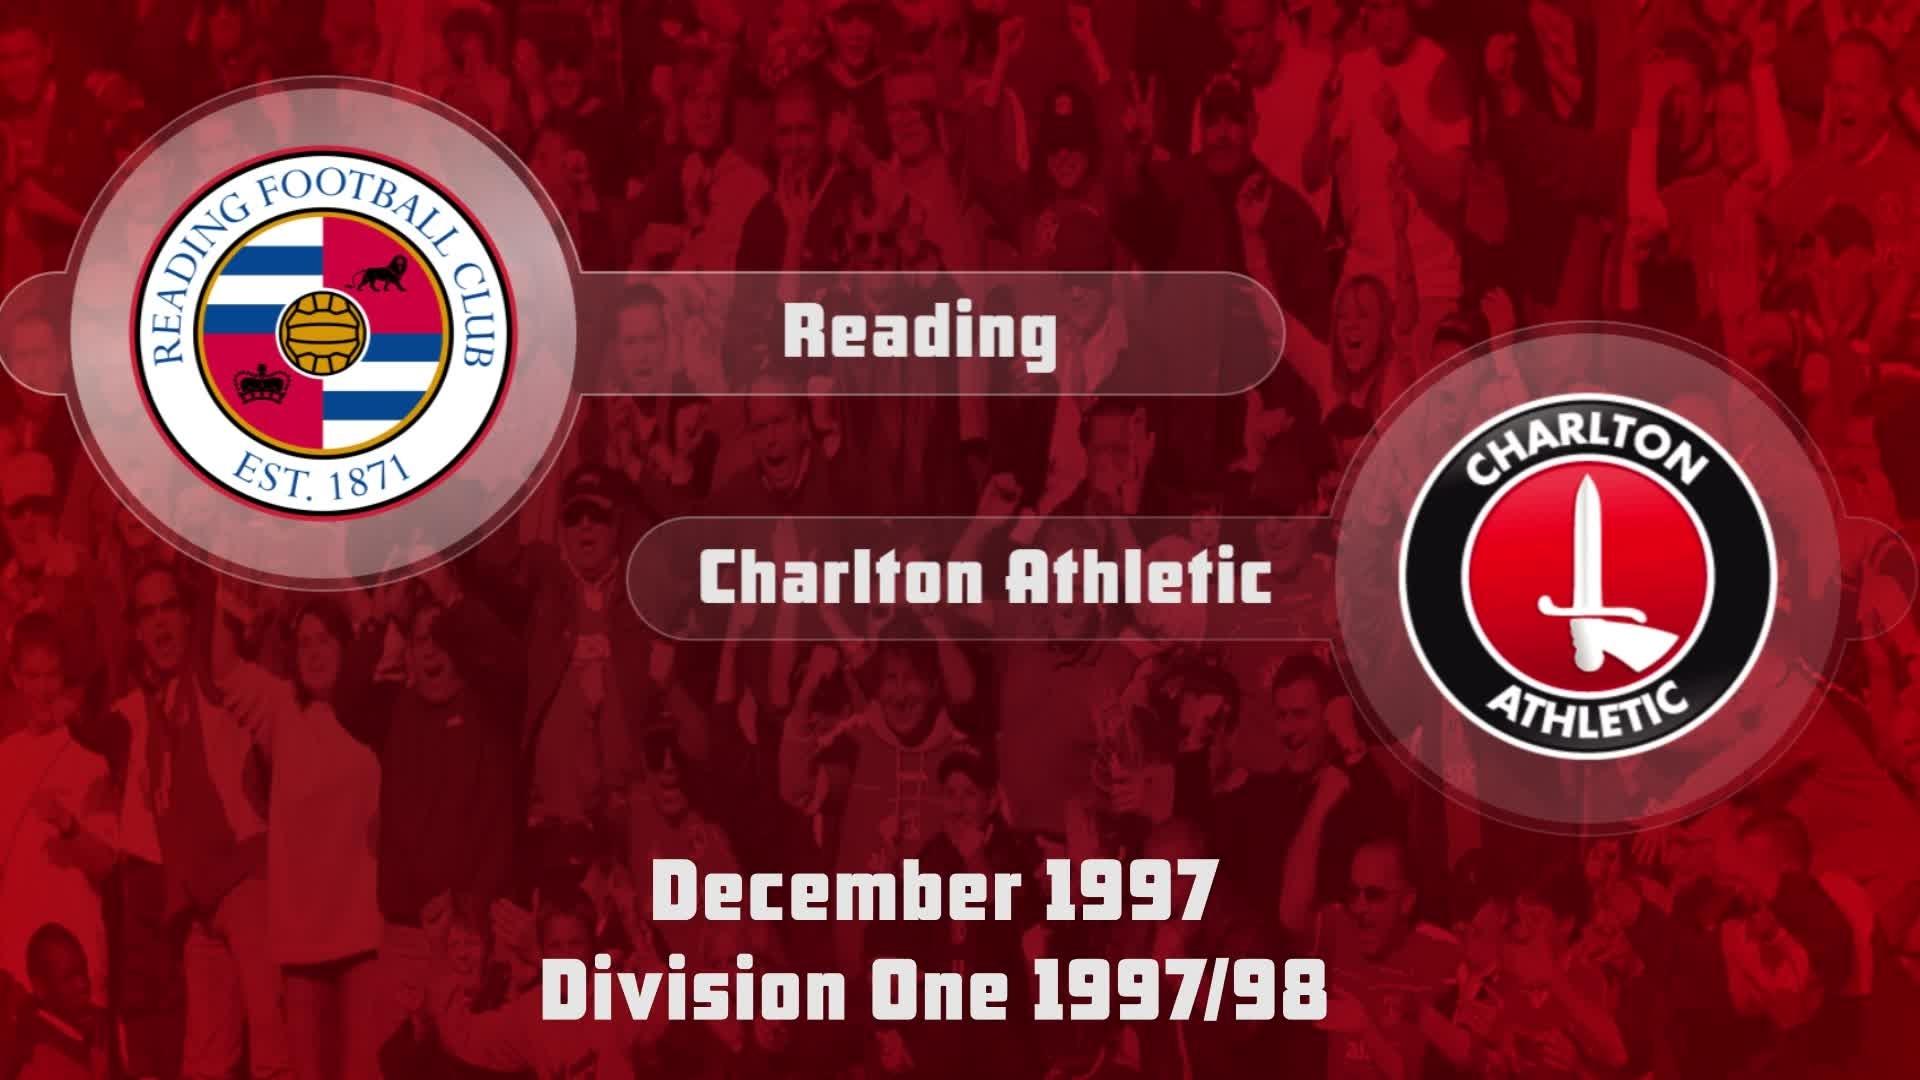 22 HIGHLIGHTS | Reading 2 Charlton 0 (Dec 1997)